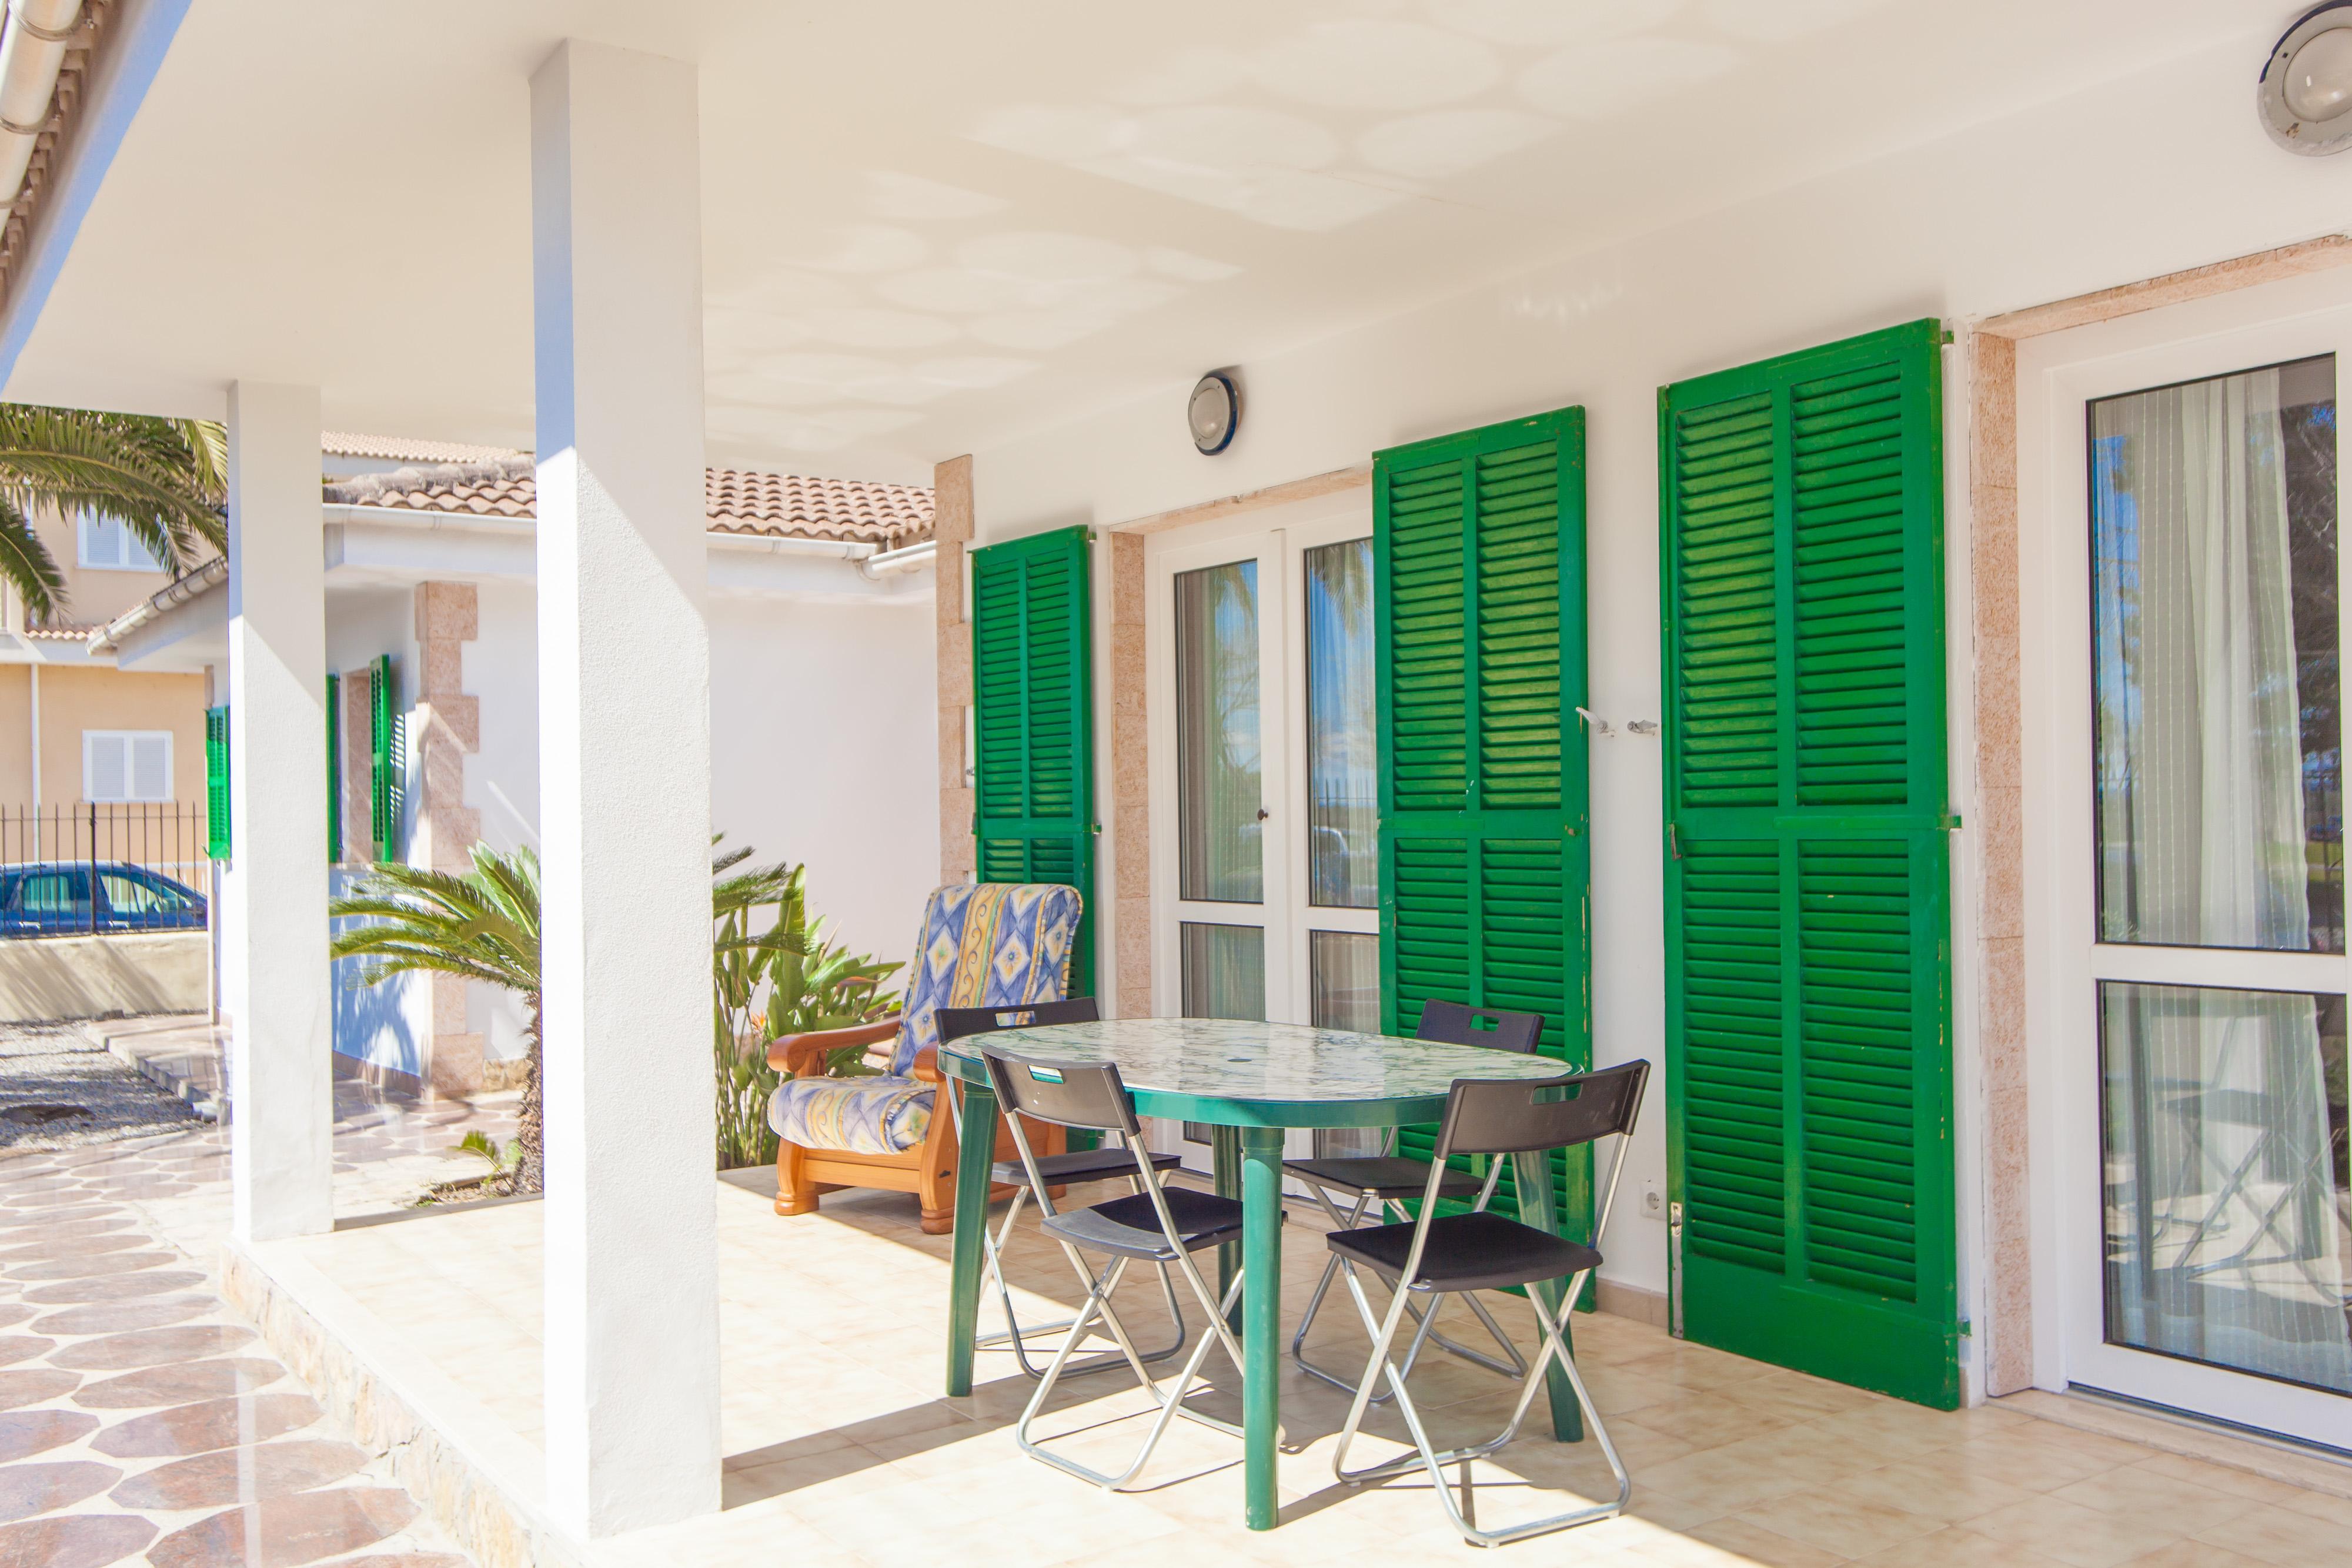 Ferienhaus RODRIGUEZ DE LA FUENTE 19 (SIN NOMBRE) (2144936), Platja de Muro, Mallorca, Balearische Inseln, Spanien, Bild 7